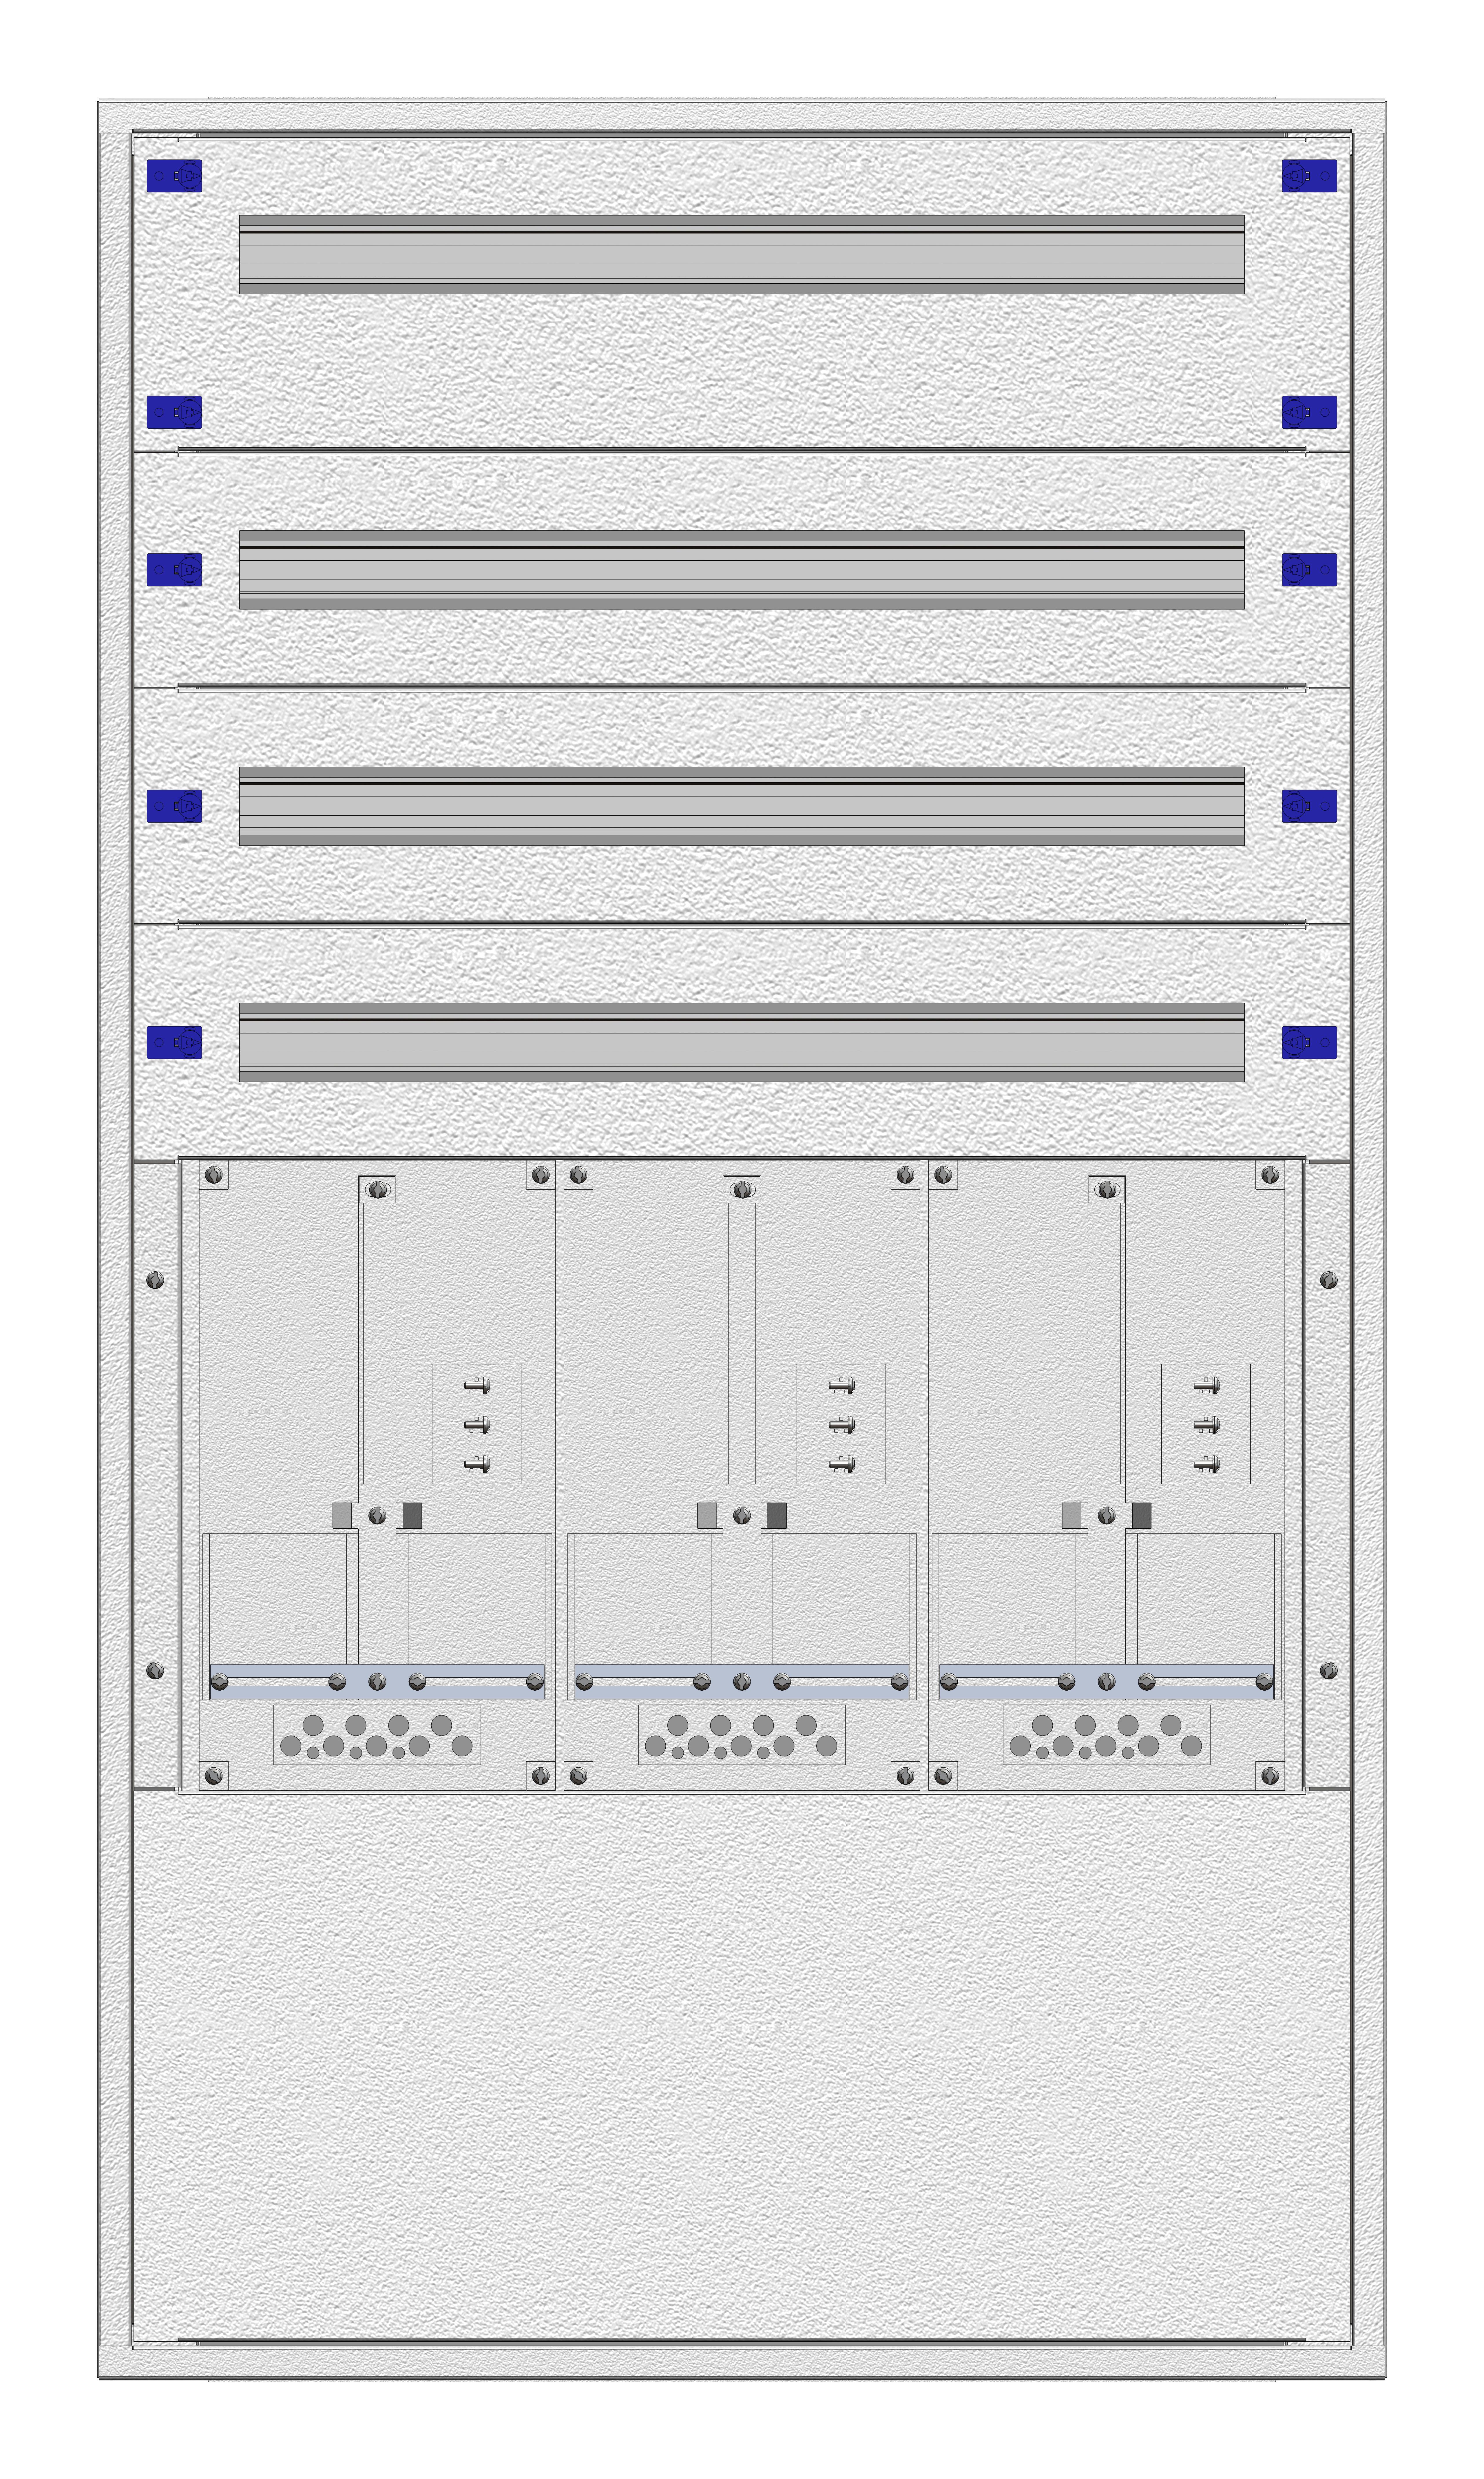 1 Stk Aufputz-Zählerverteiler 3A-28E/NOE 3ZP, H1380B810T250mm IL160328NS